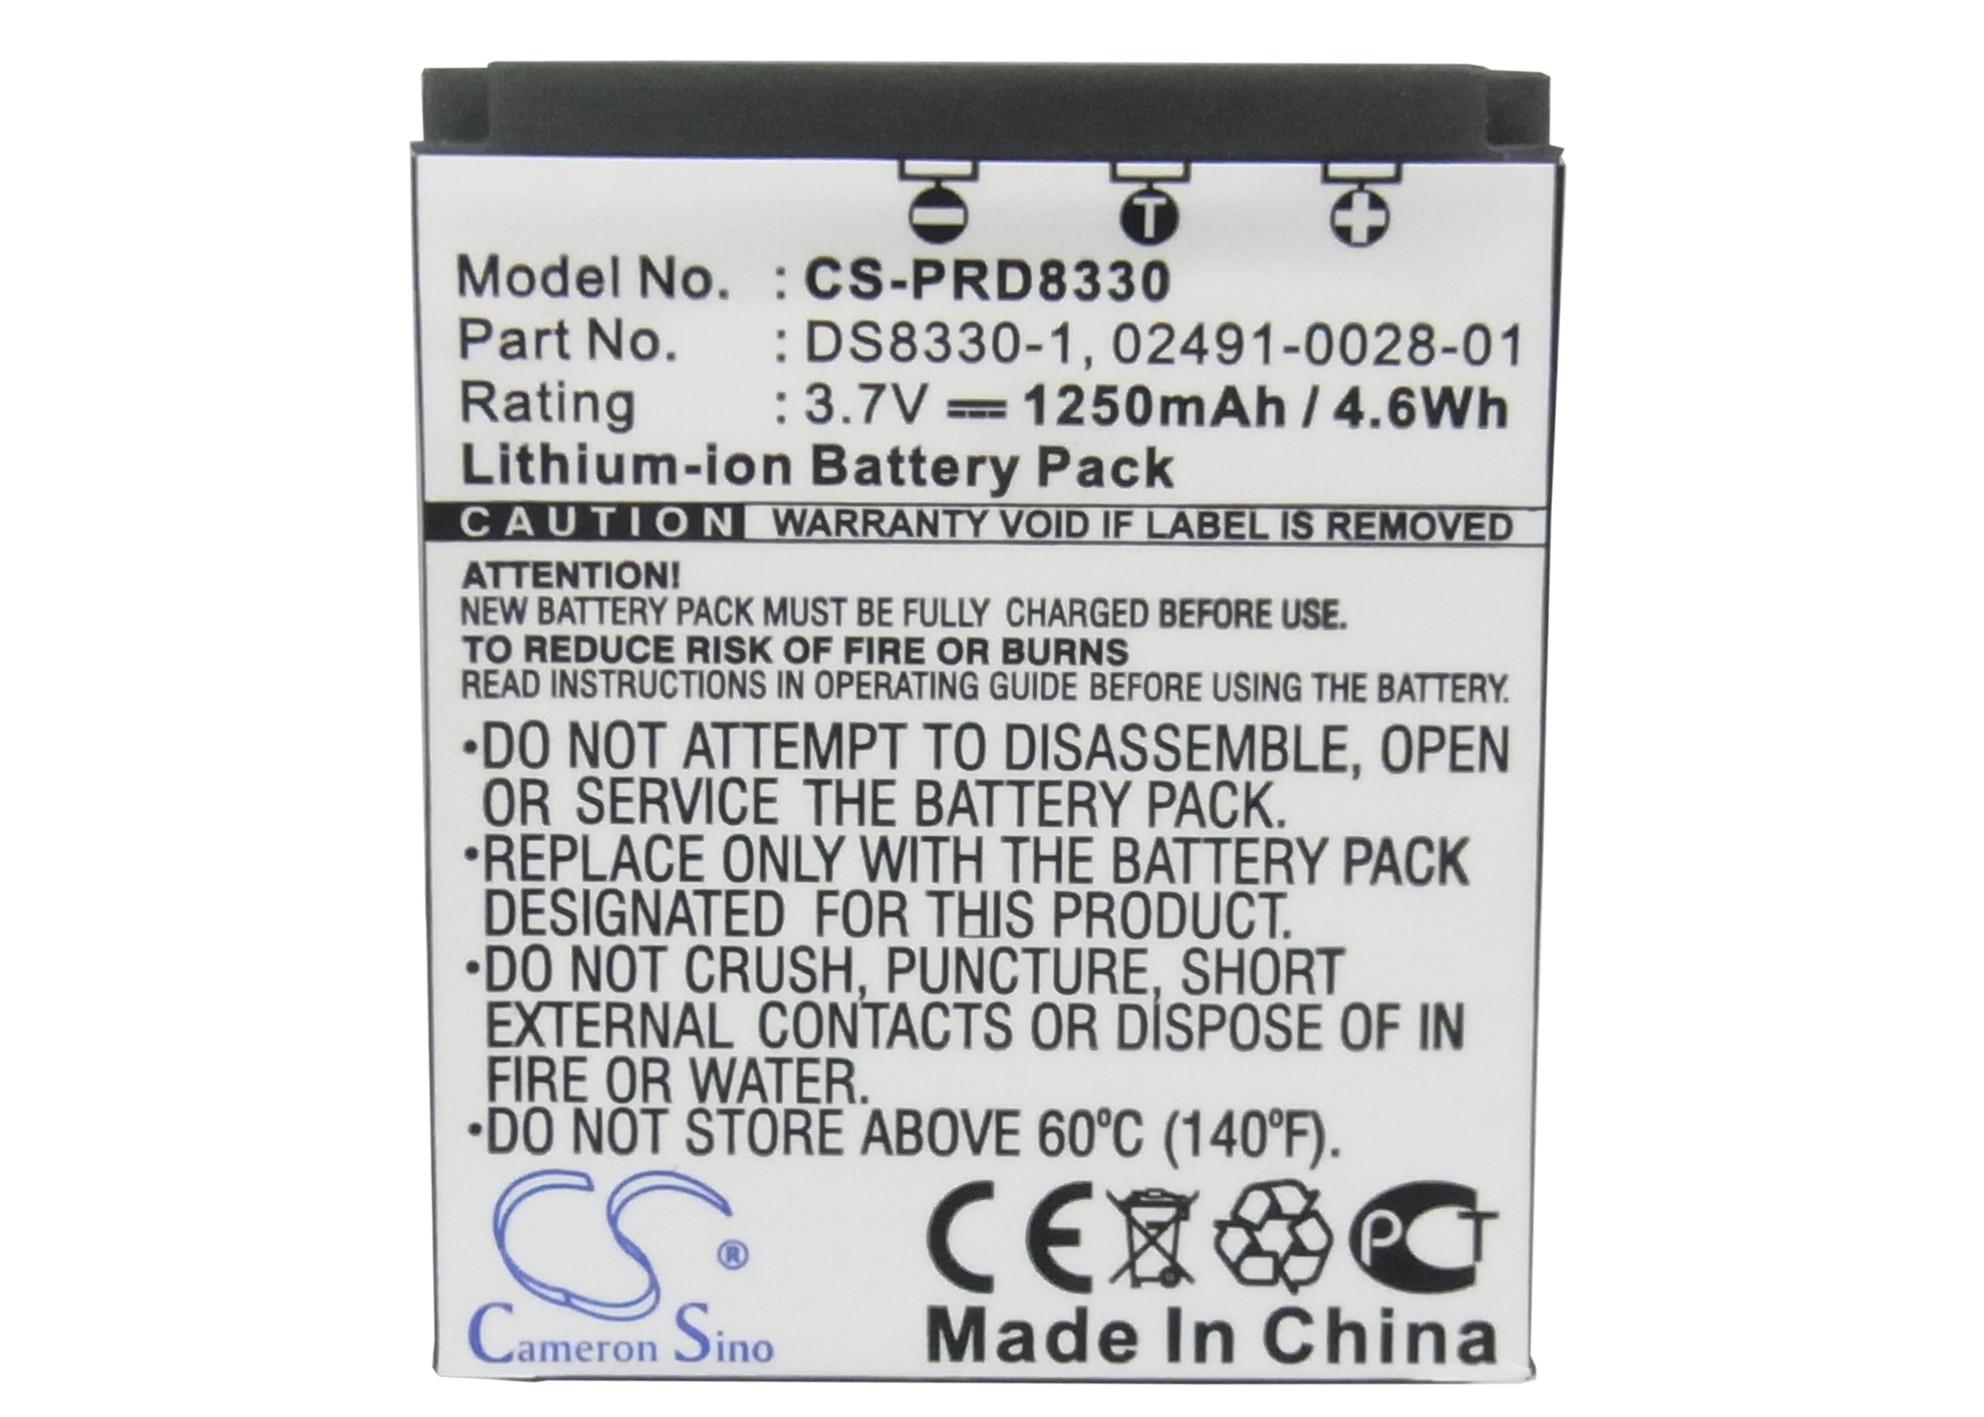 Cameron Sino 1250mAh Batteria DS8330-1 per Acer CP-8531, CR-8530, BATS8 Per Avant S10, S10x6, s8, S8x6, Per HITACHI HDC831E